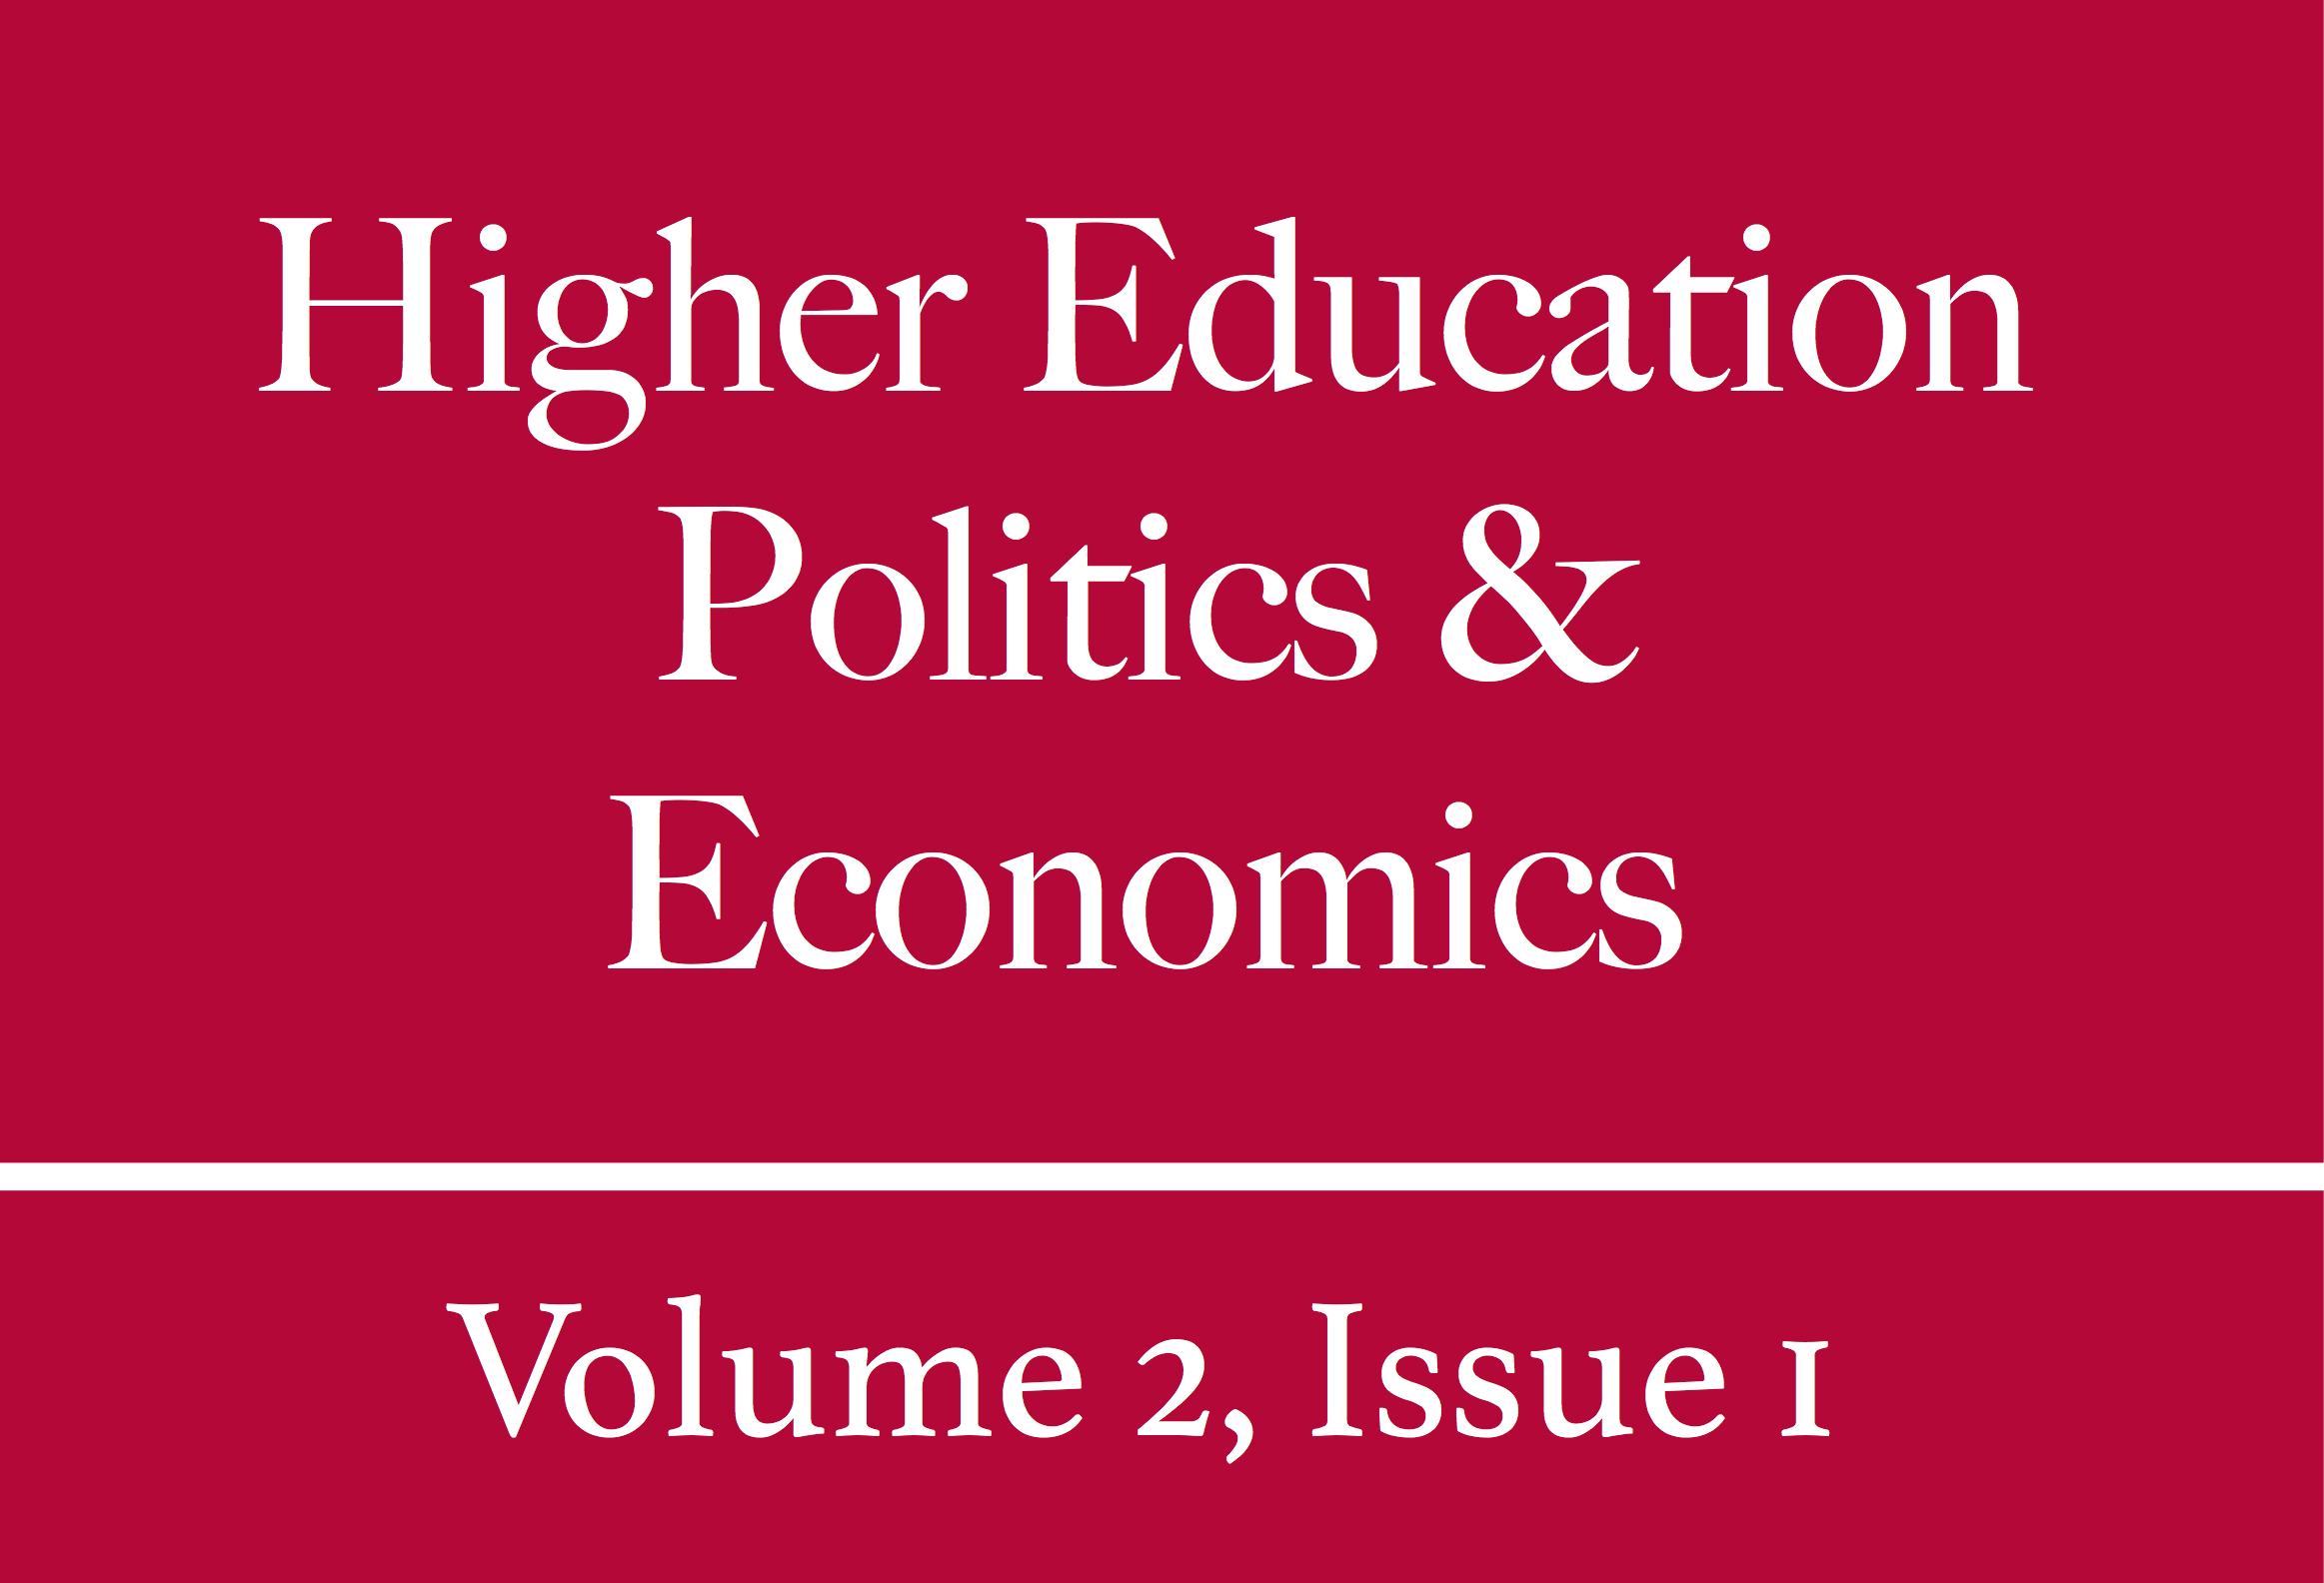 HEPE Volume 2, Issue 1